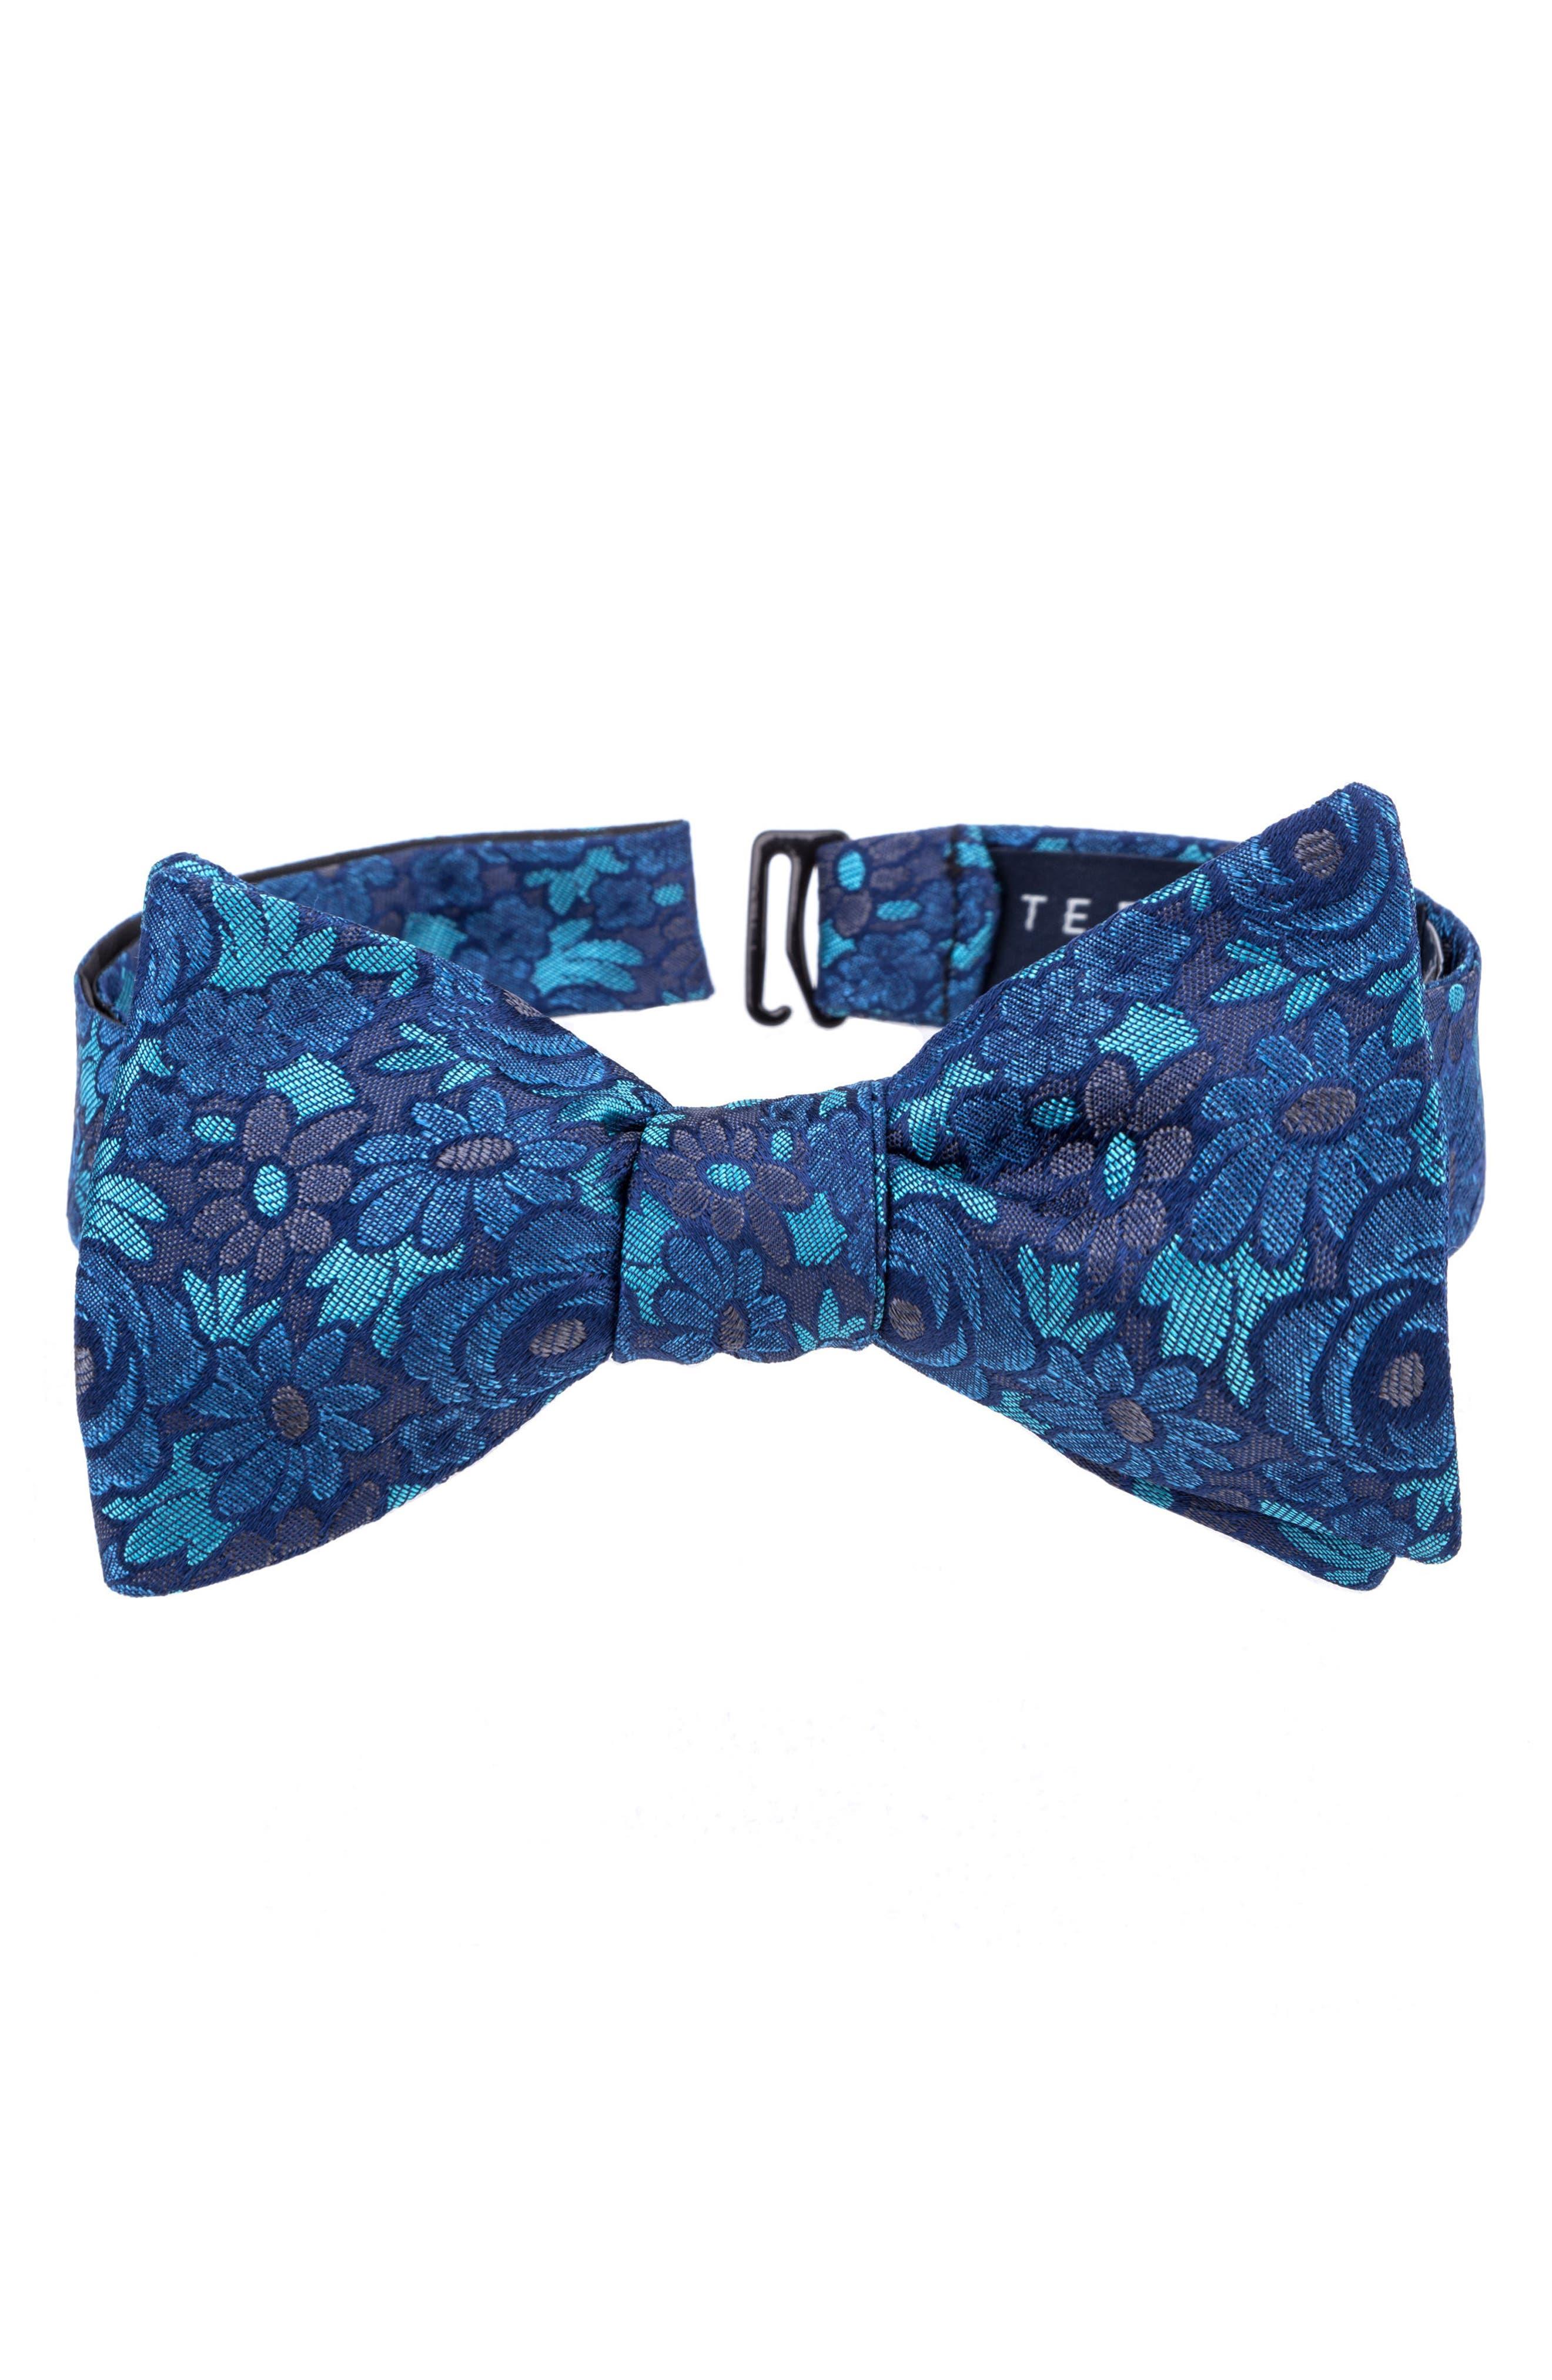 Alternate Image 1 Selected - Ted Baker London Botanical Silk Bow Tie